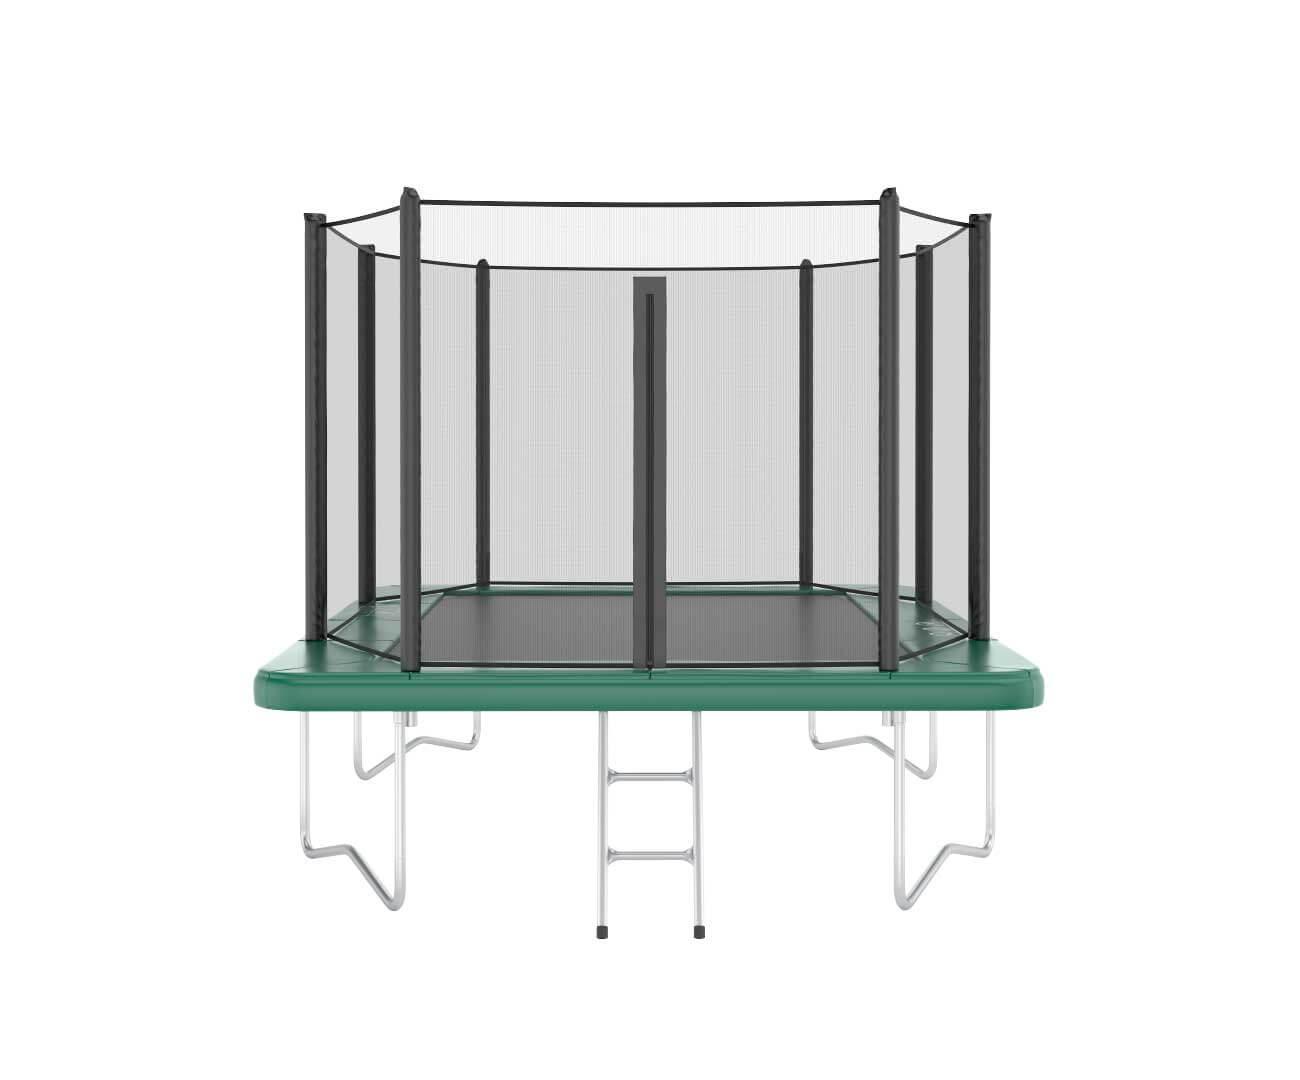 Akrobat Orbit 10x6 Green safety pad/Black jumping mat